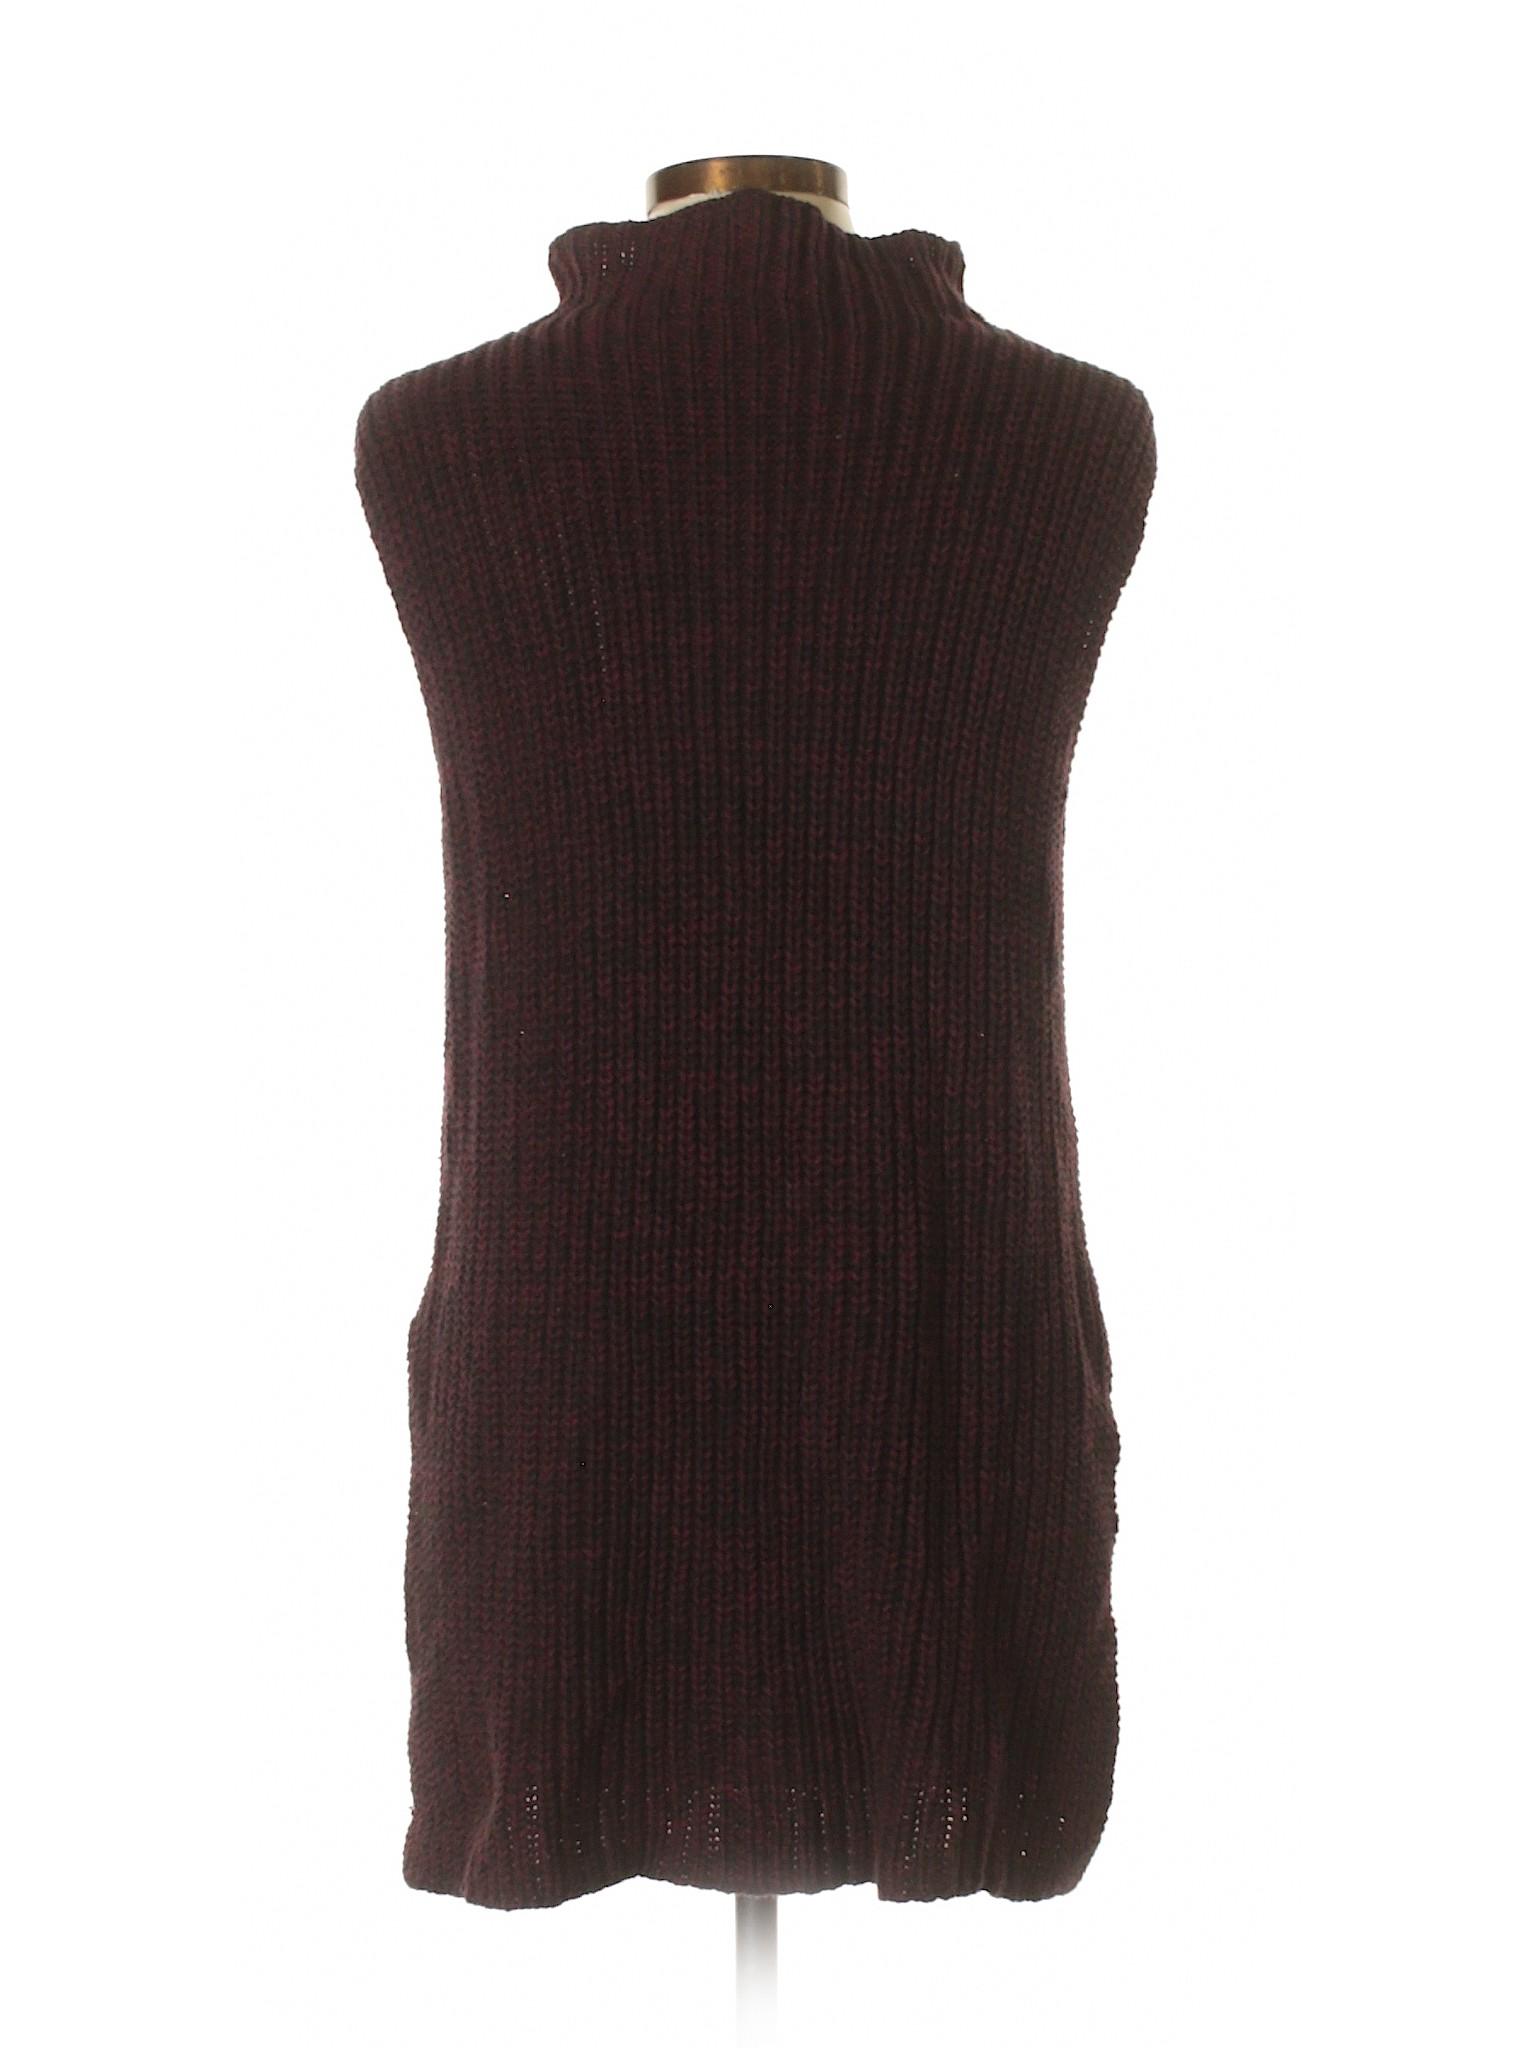 Boutique winter Taylor Sweater LOFT Ann Turtleneck nR8RwfqTPr